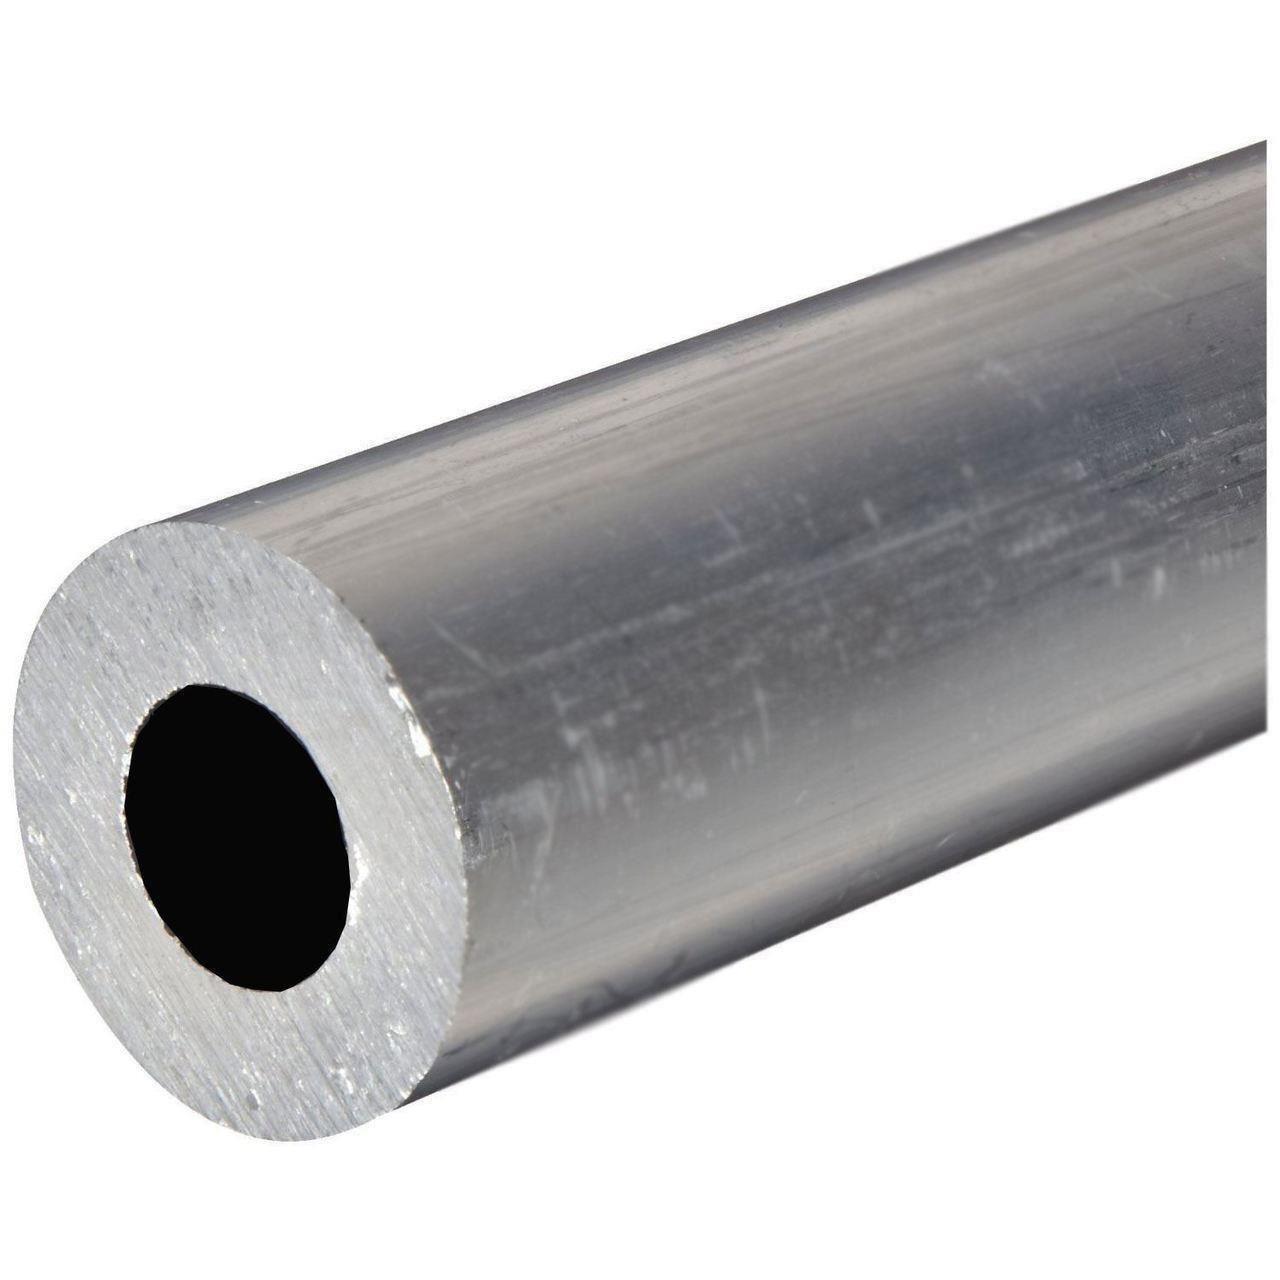 T aluminum round tube hollow bar quot od id